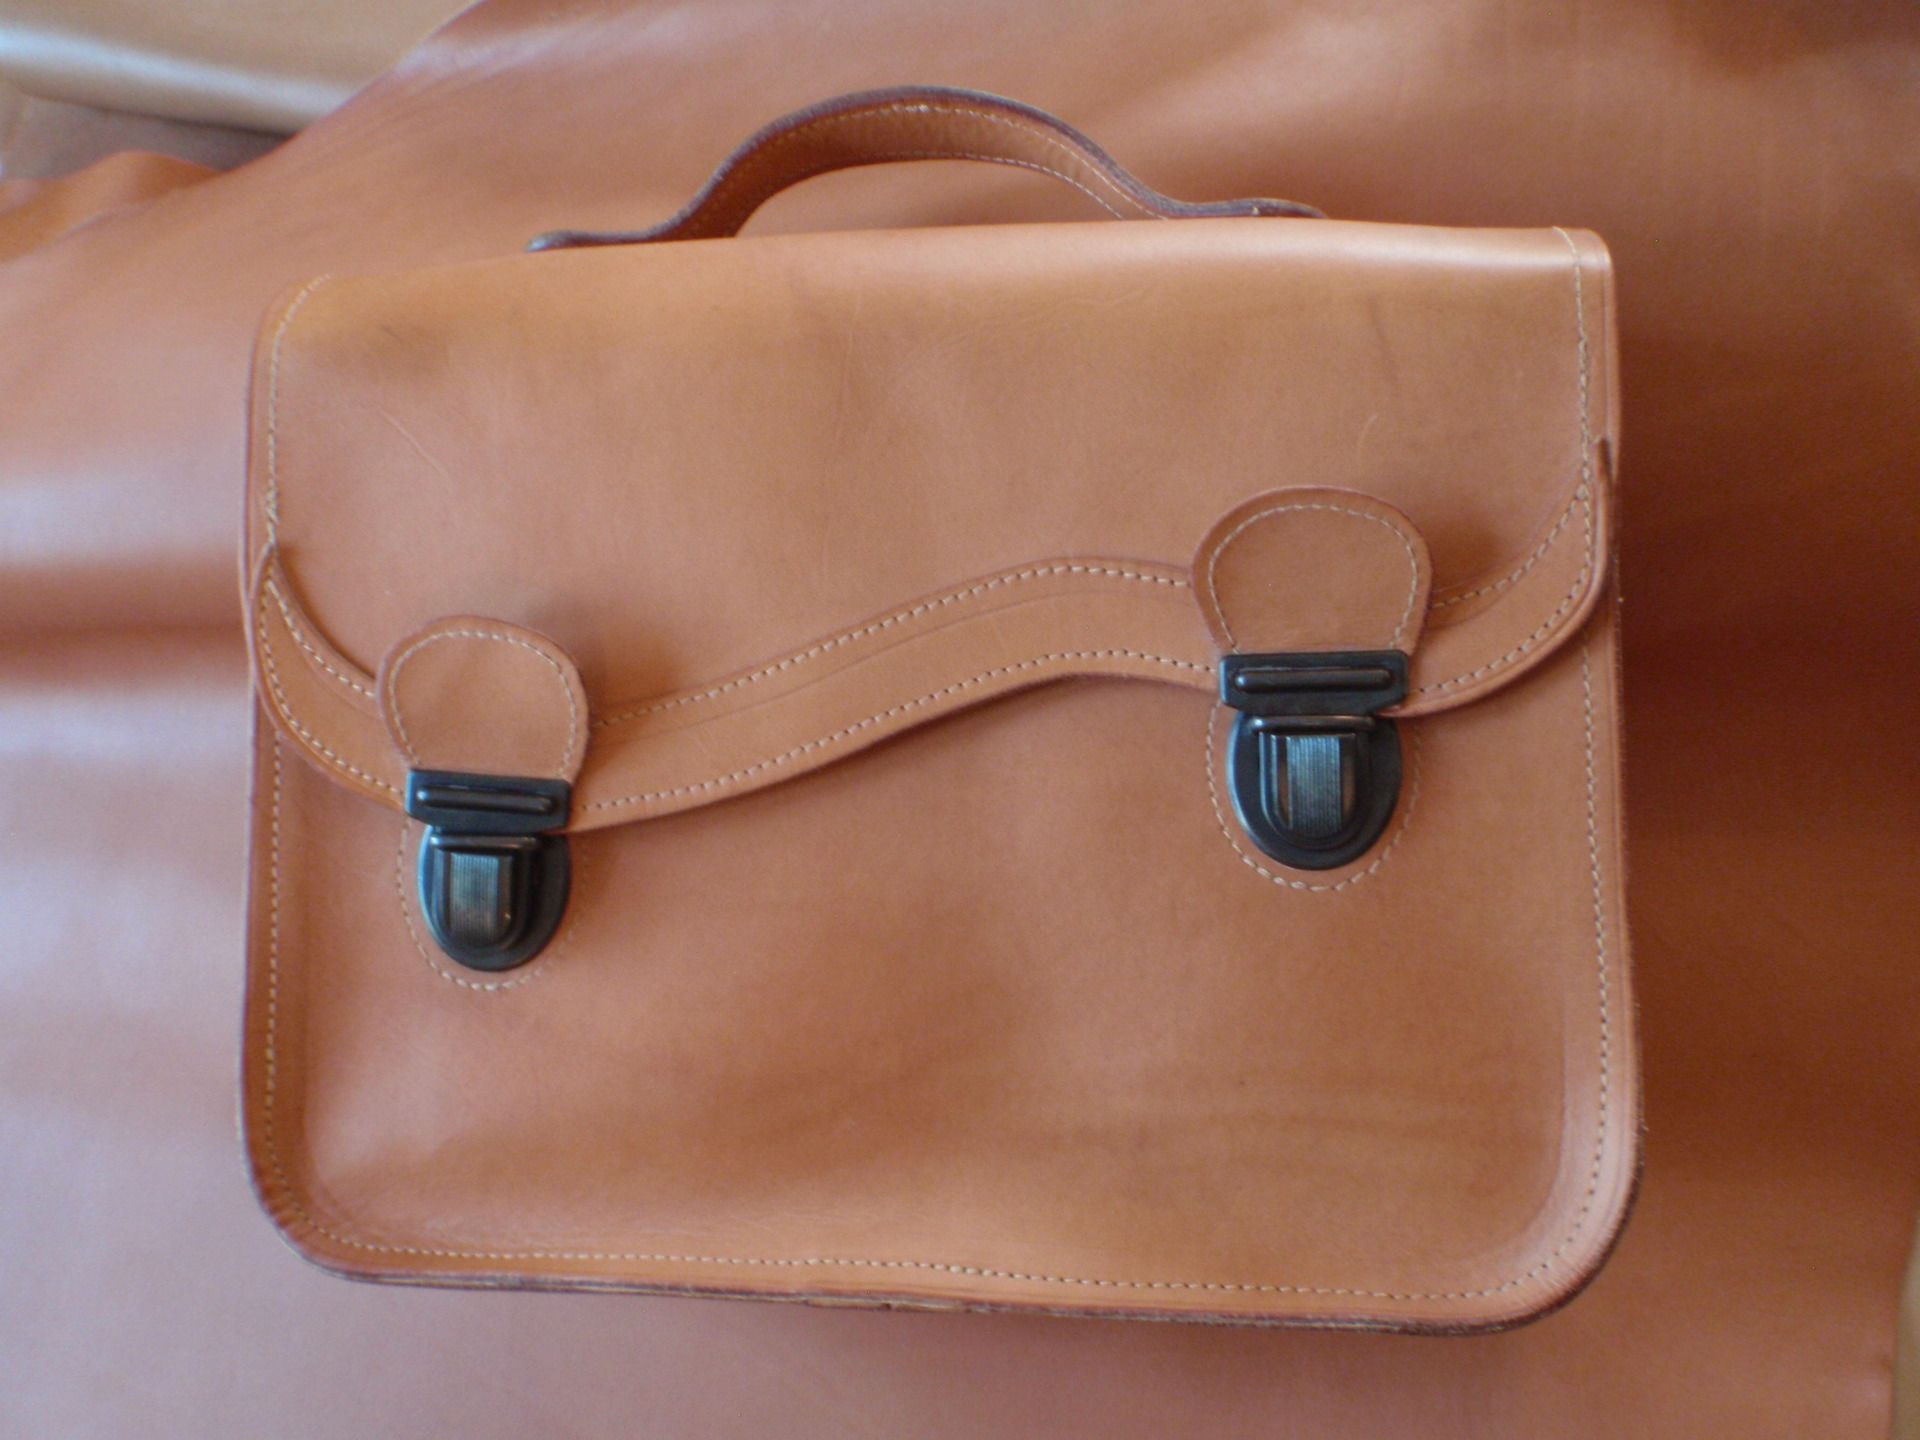 4b32f34a3090 Cartable cuir naturel tannage végétal   Sacs à dos, cartables par cyfel